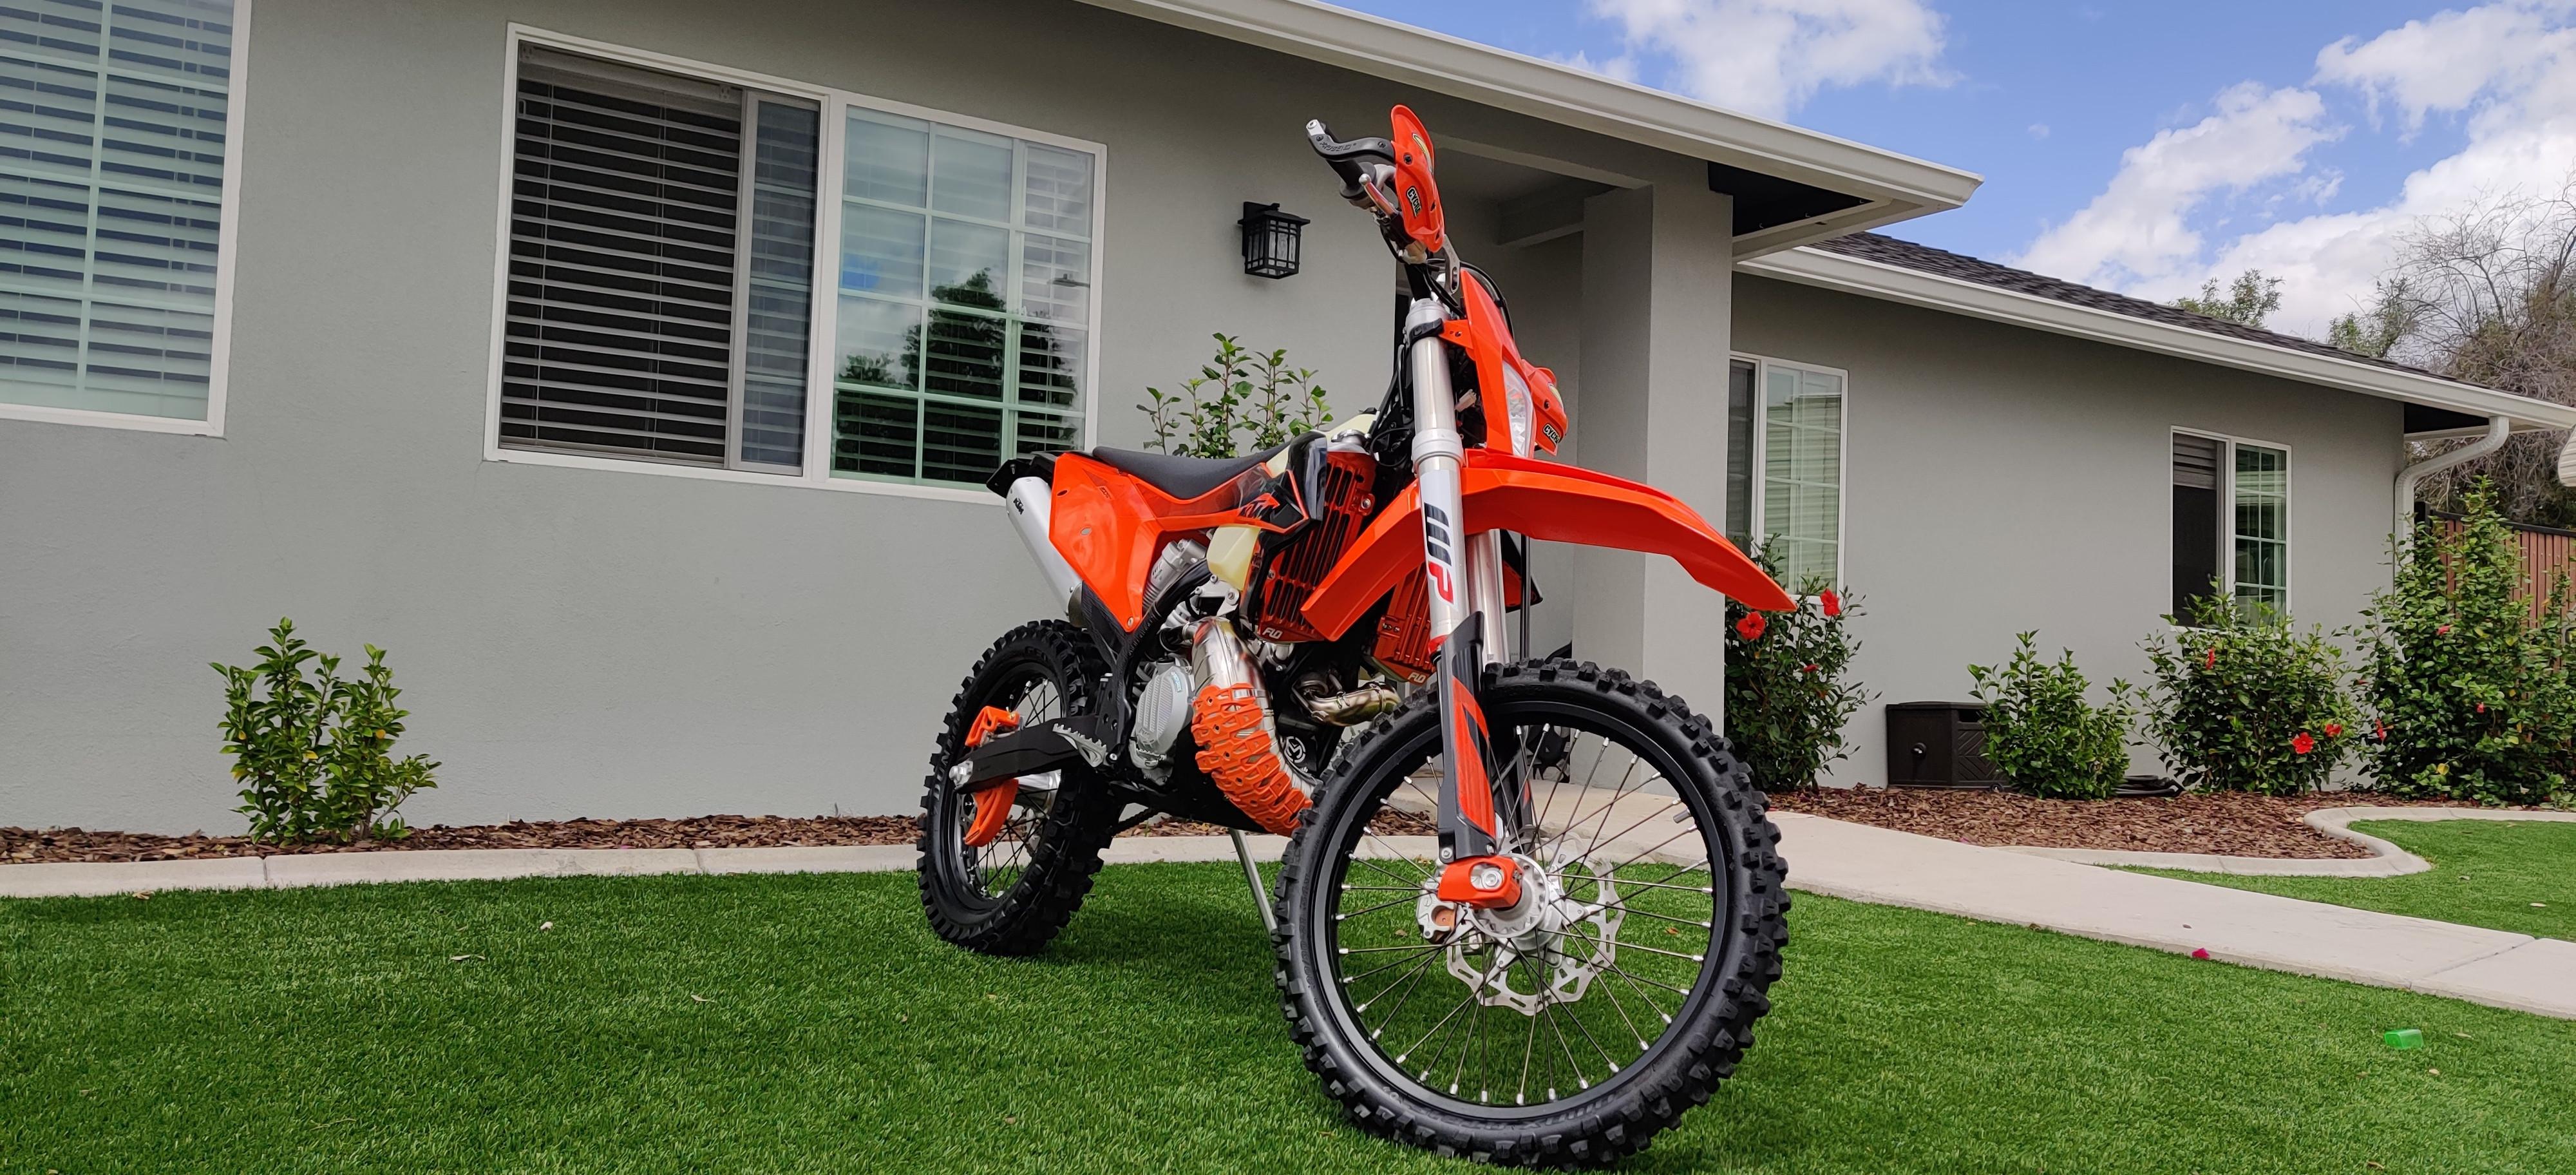 KTM 300 24 Hr Rental